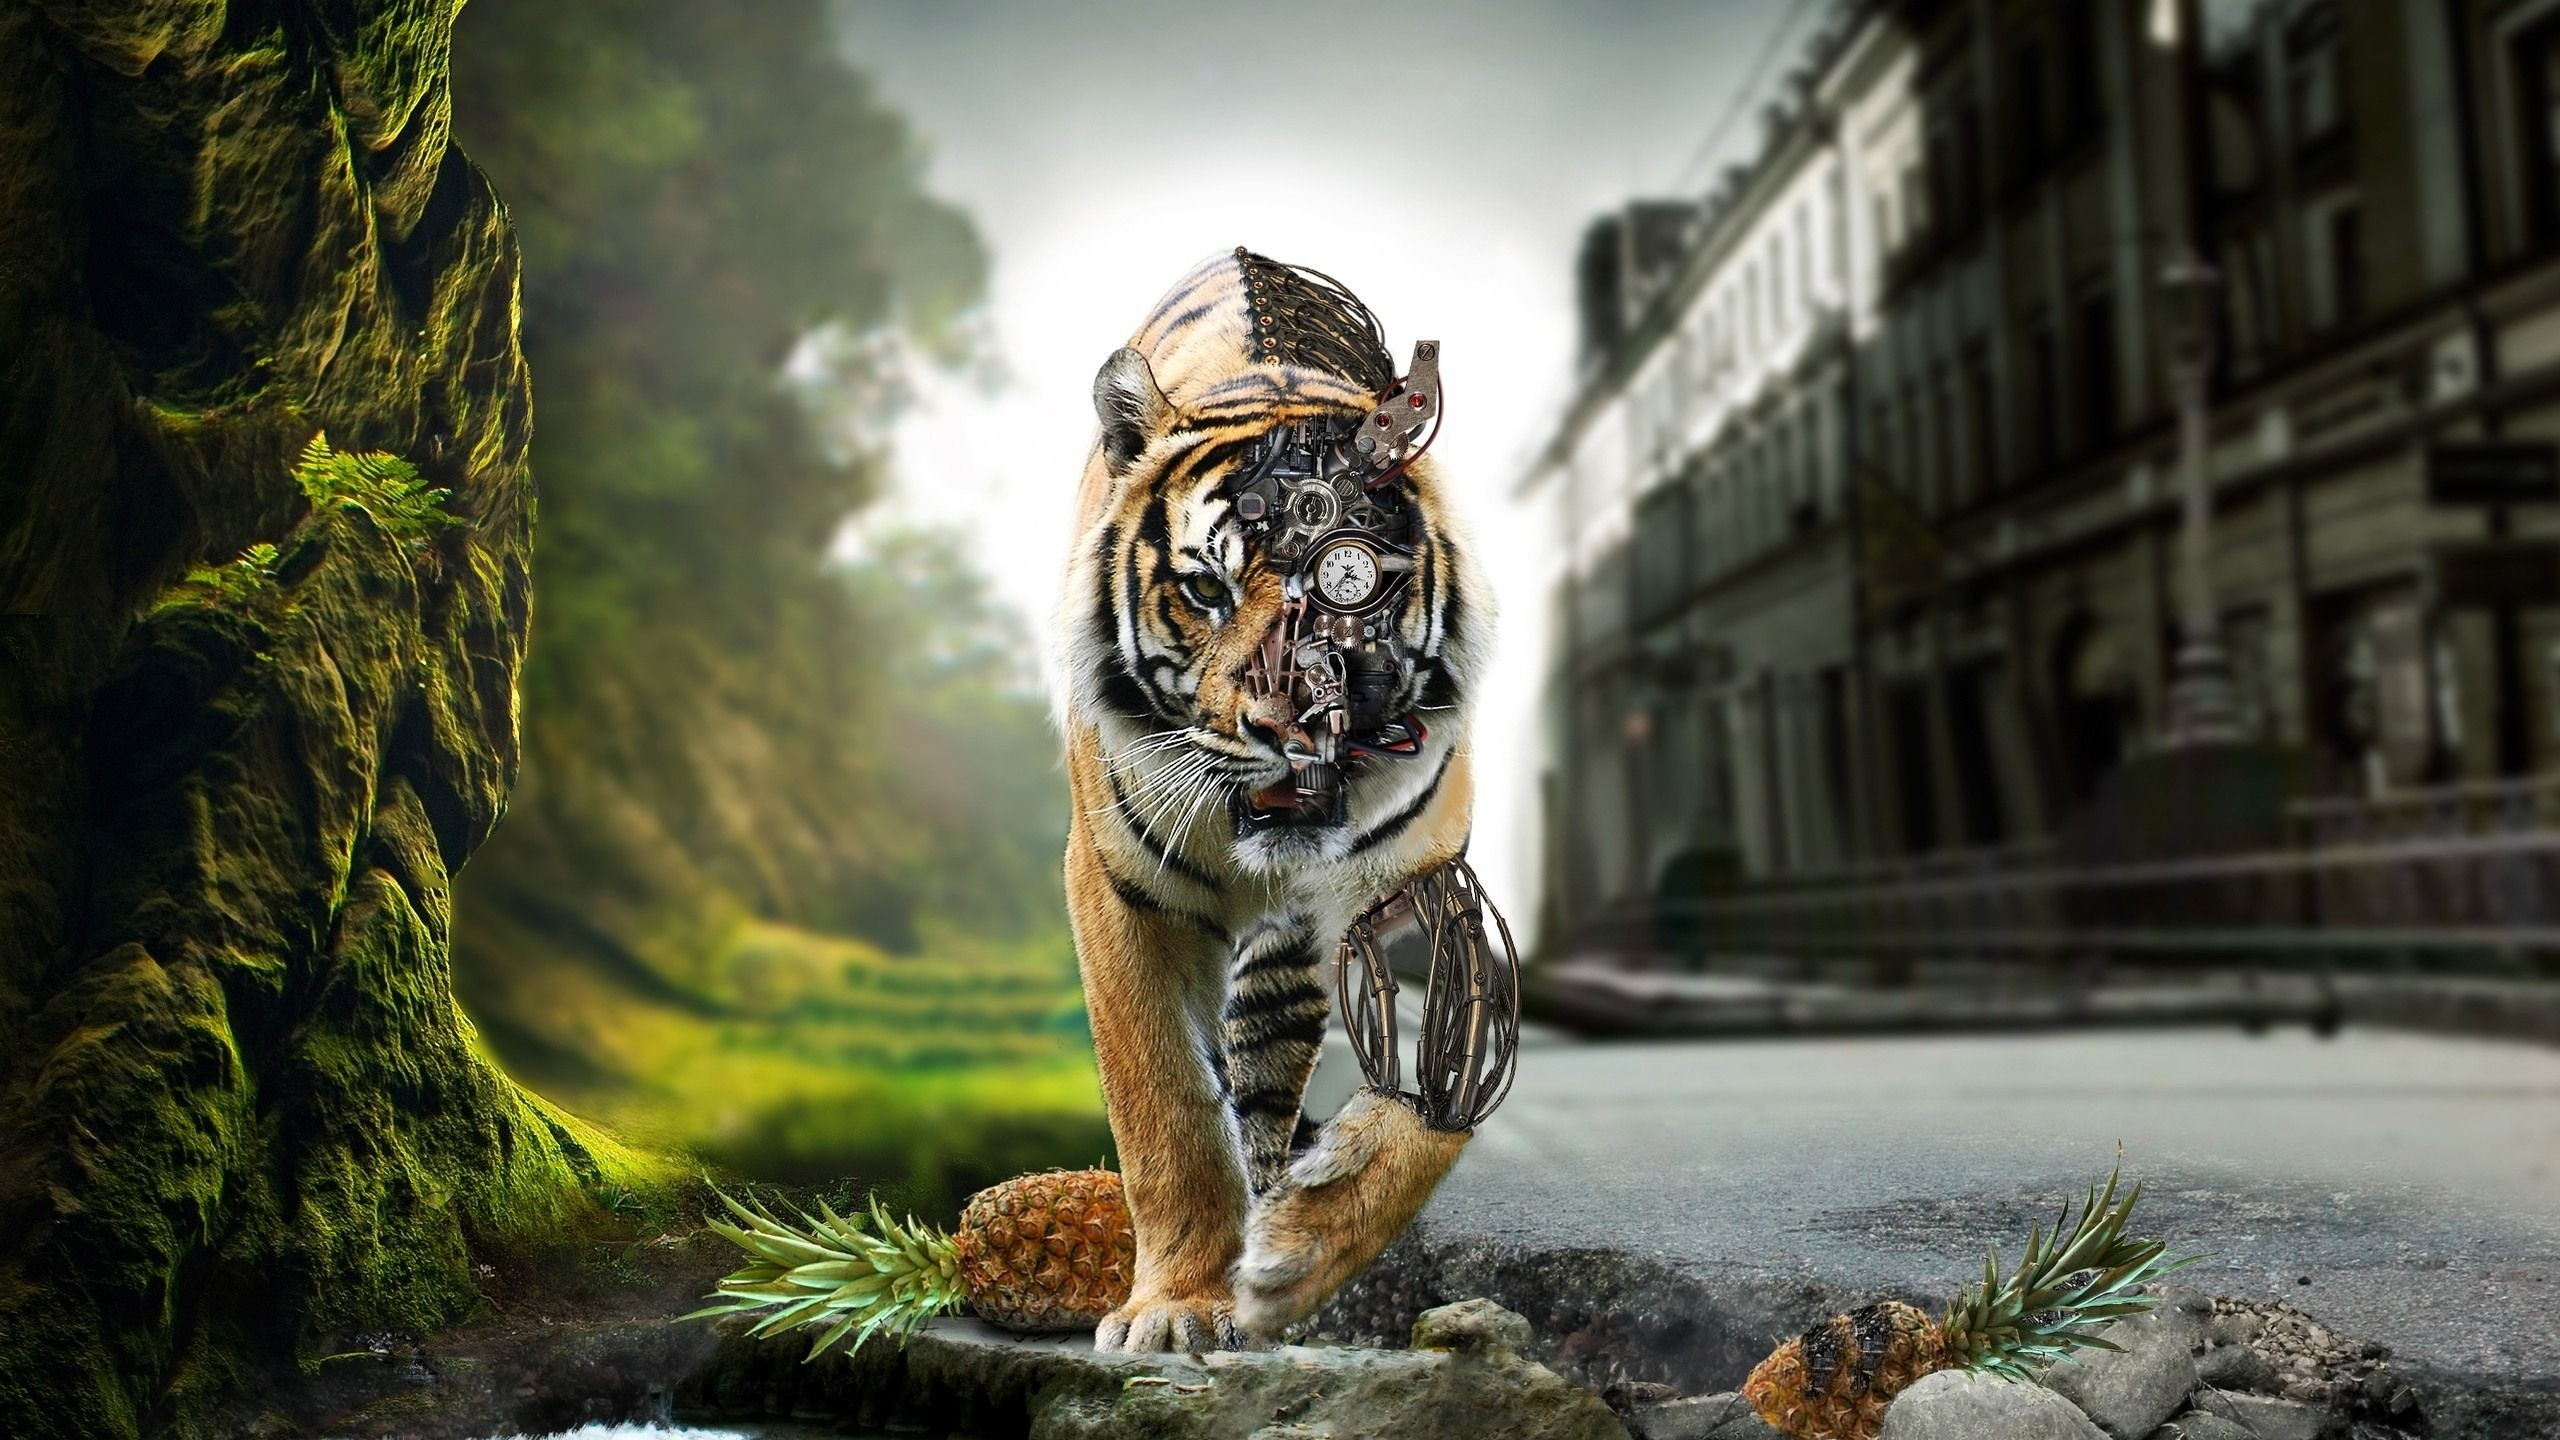 Mechanical-tiger-x-wallpaper-wp5209219